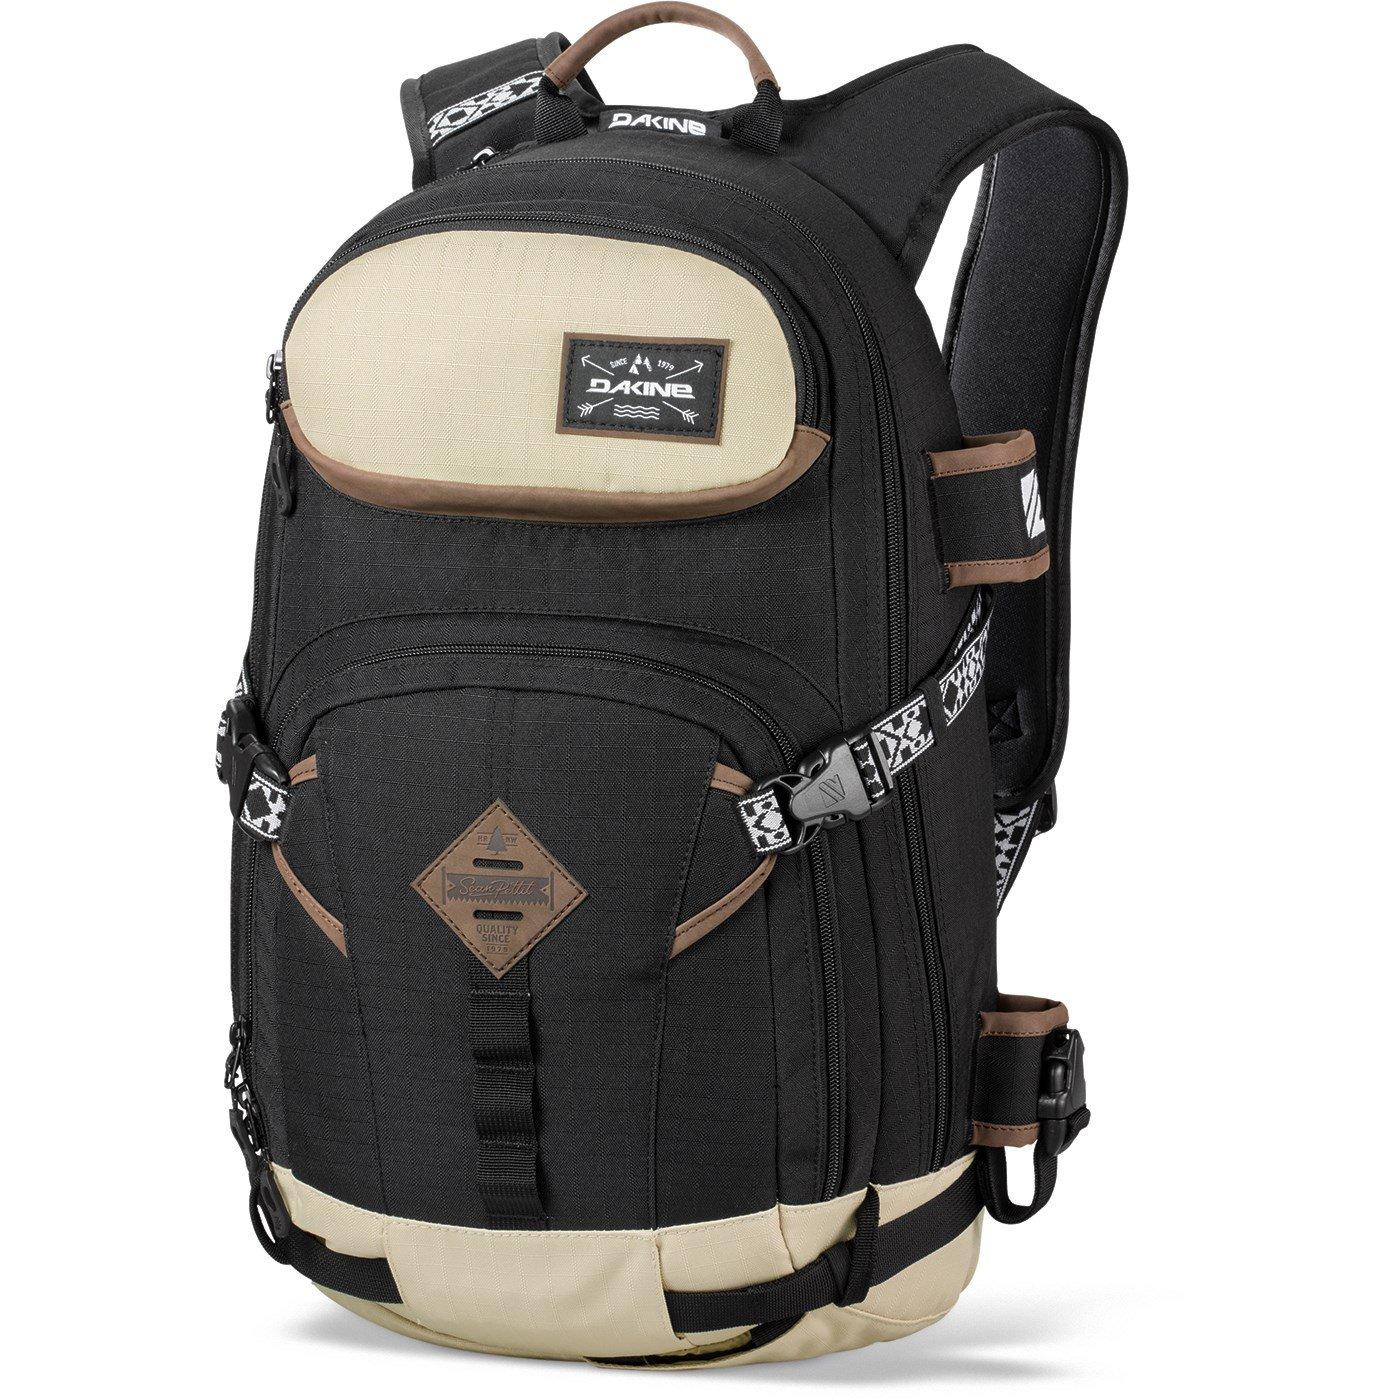 DaKine Sean Pettit Team Heli Pro Backpack 20L | evo